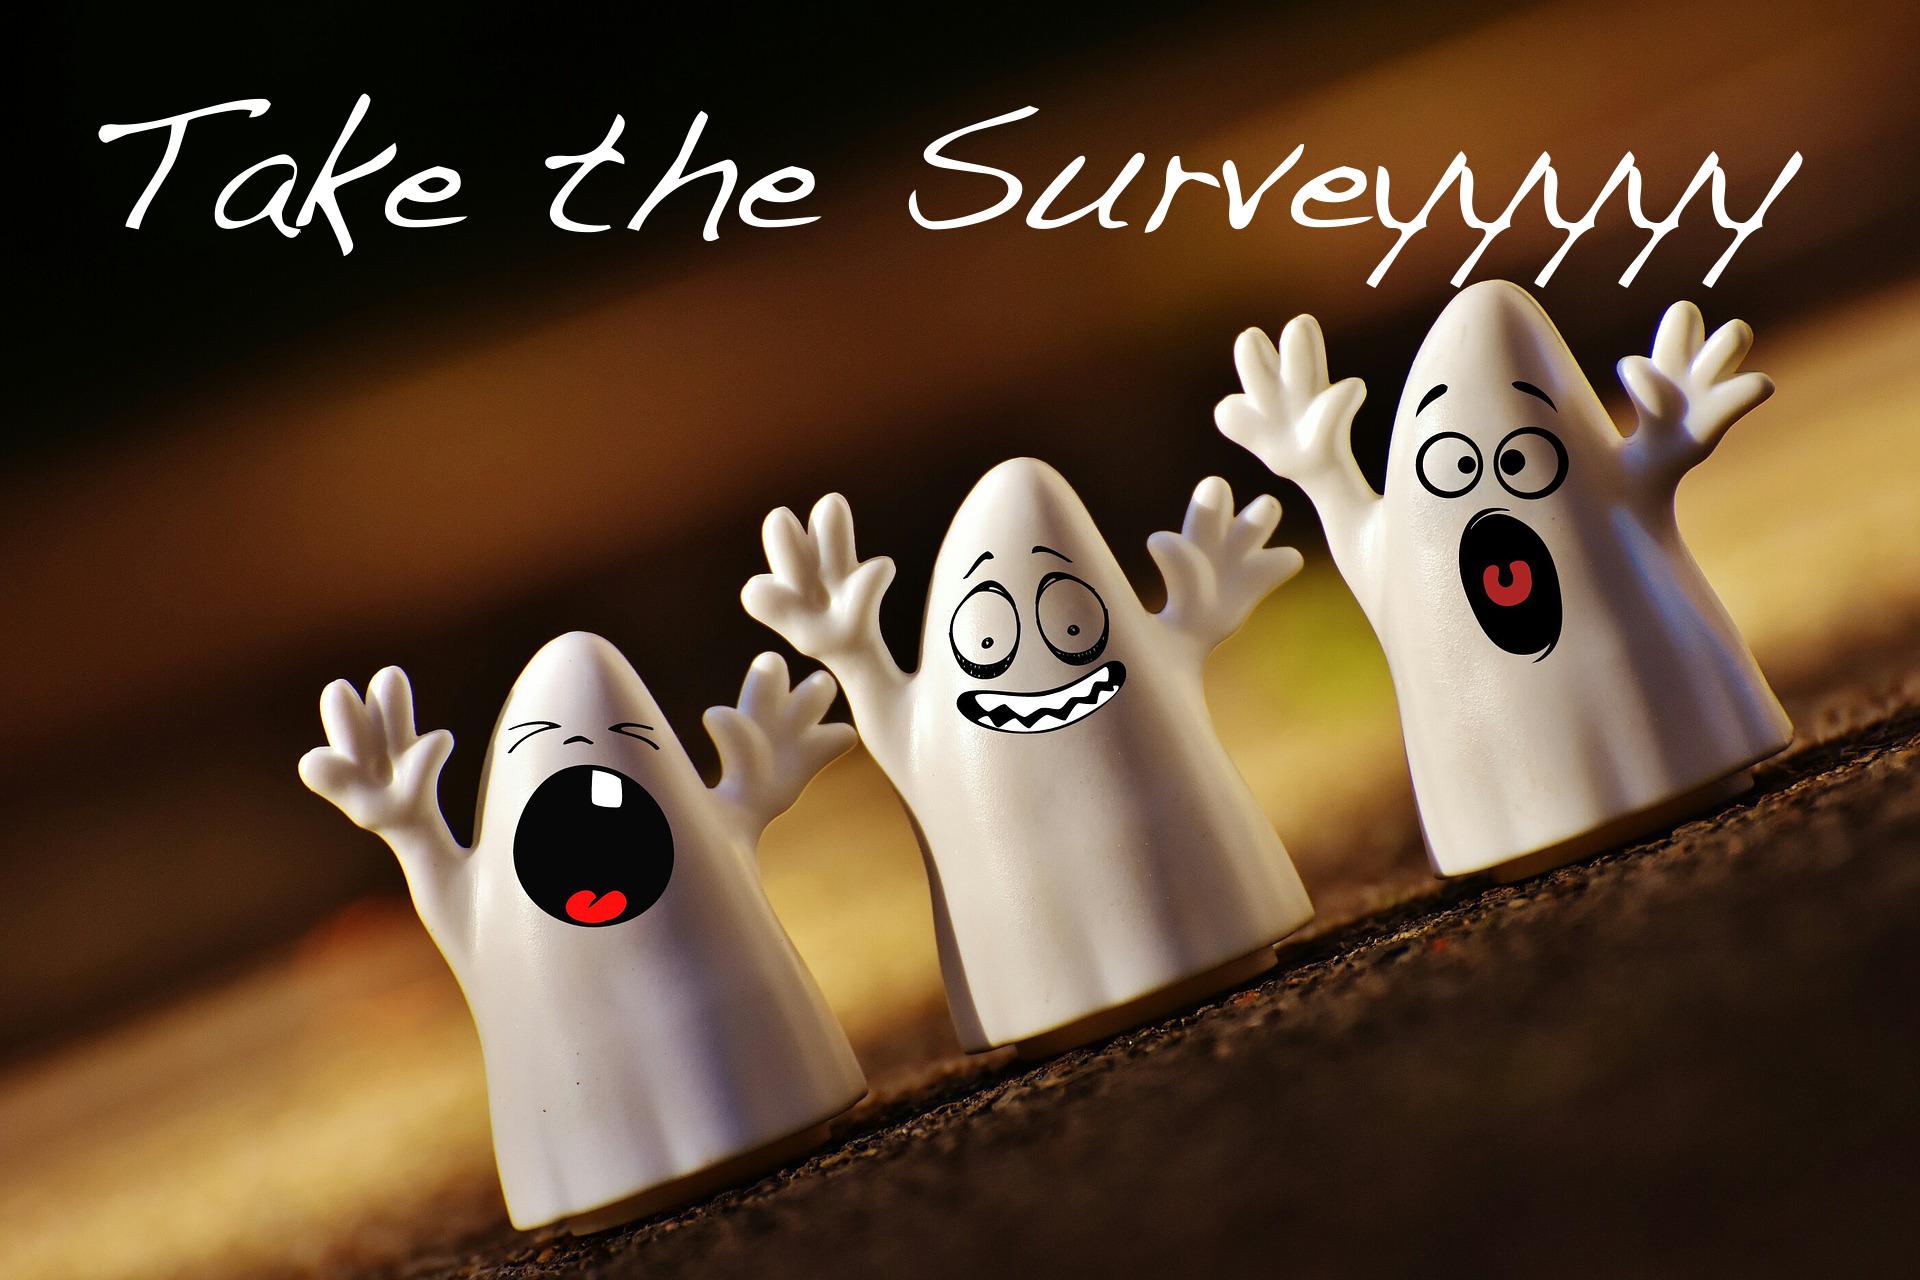 Take the Survey Image